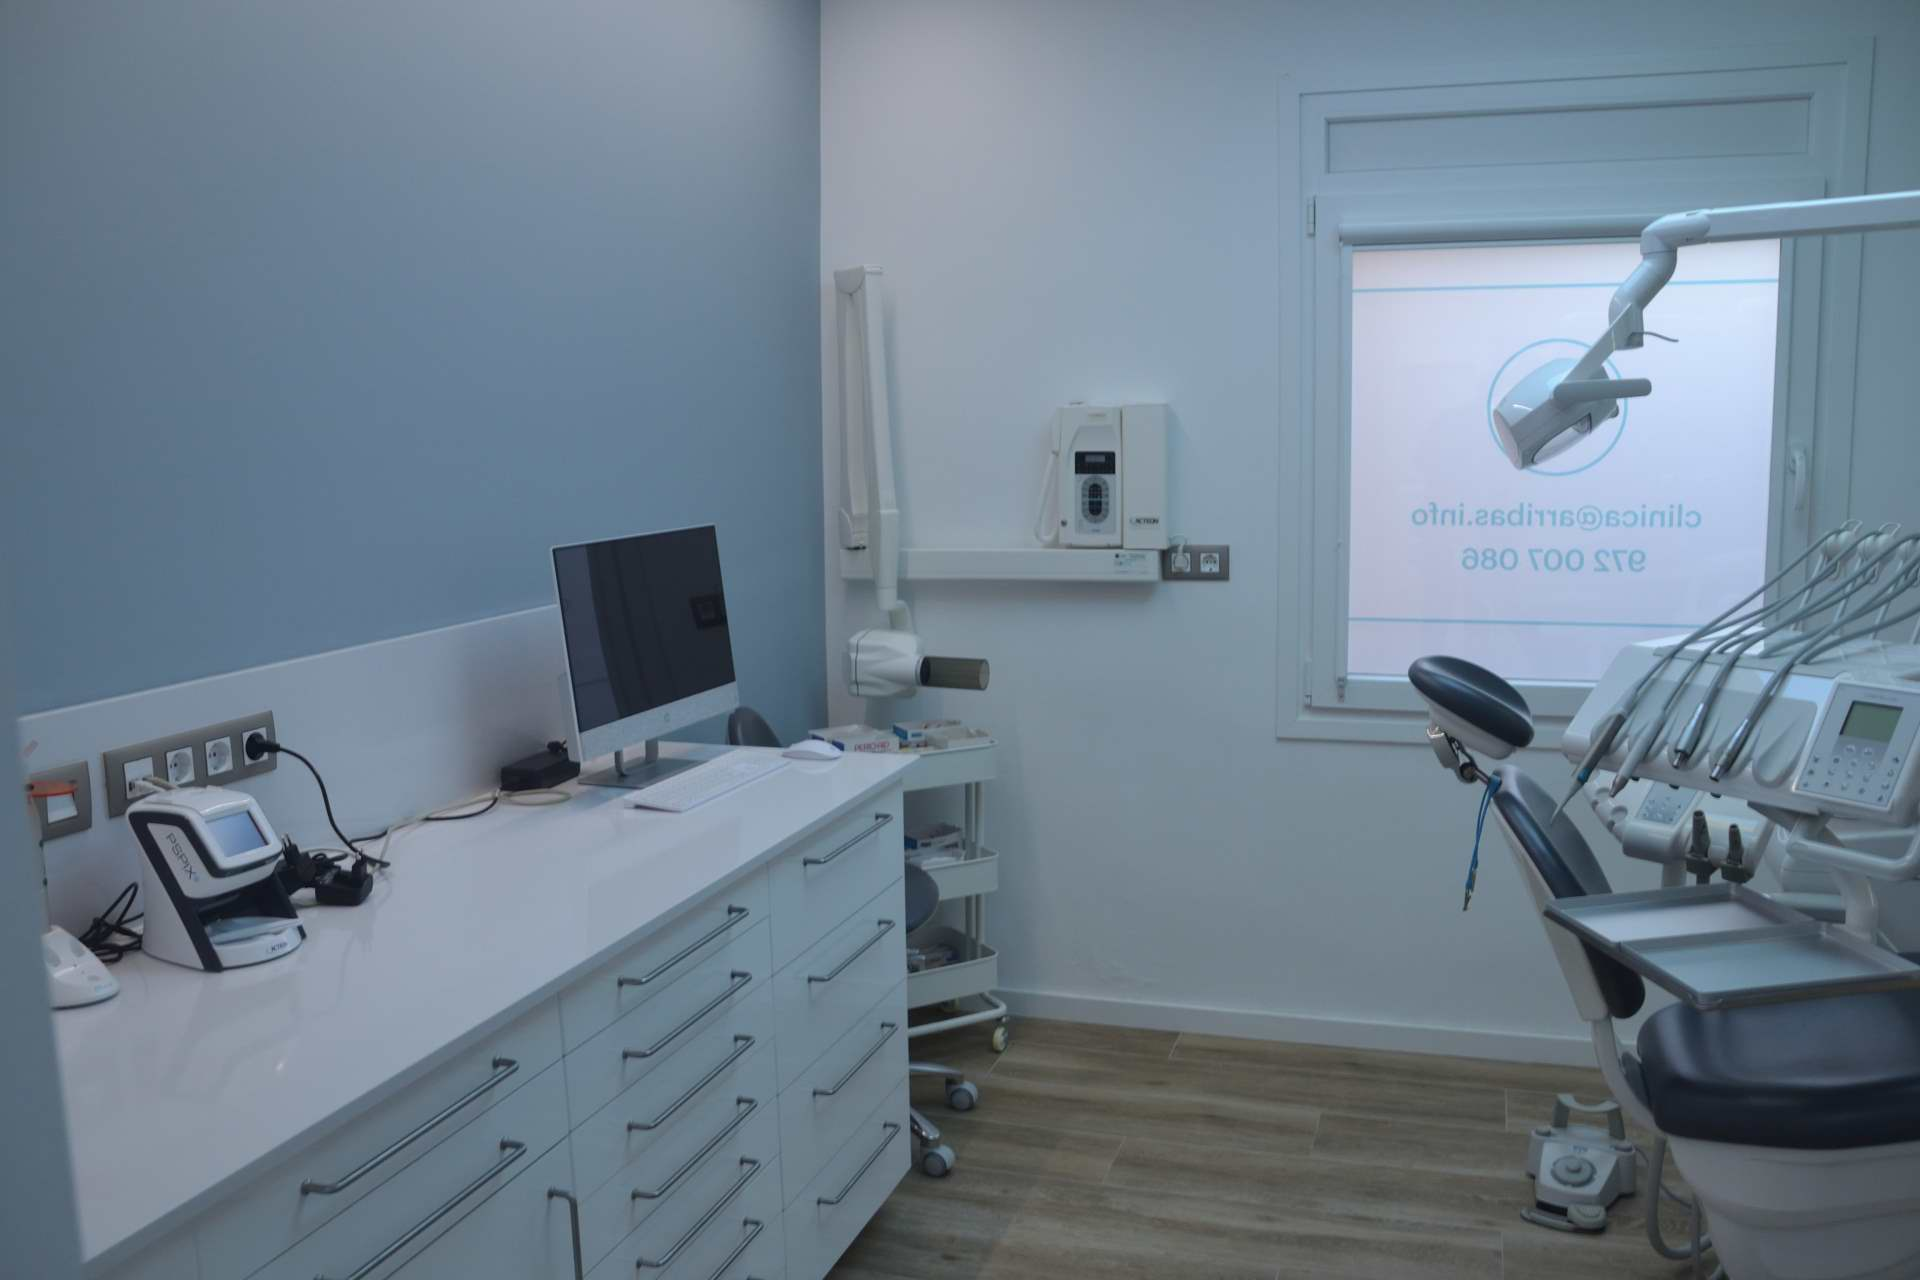 Clinica Odontologica Girona